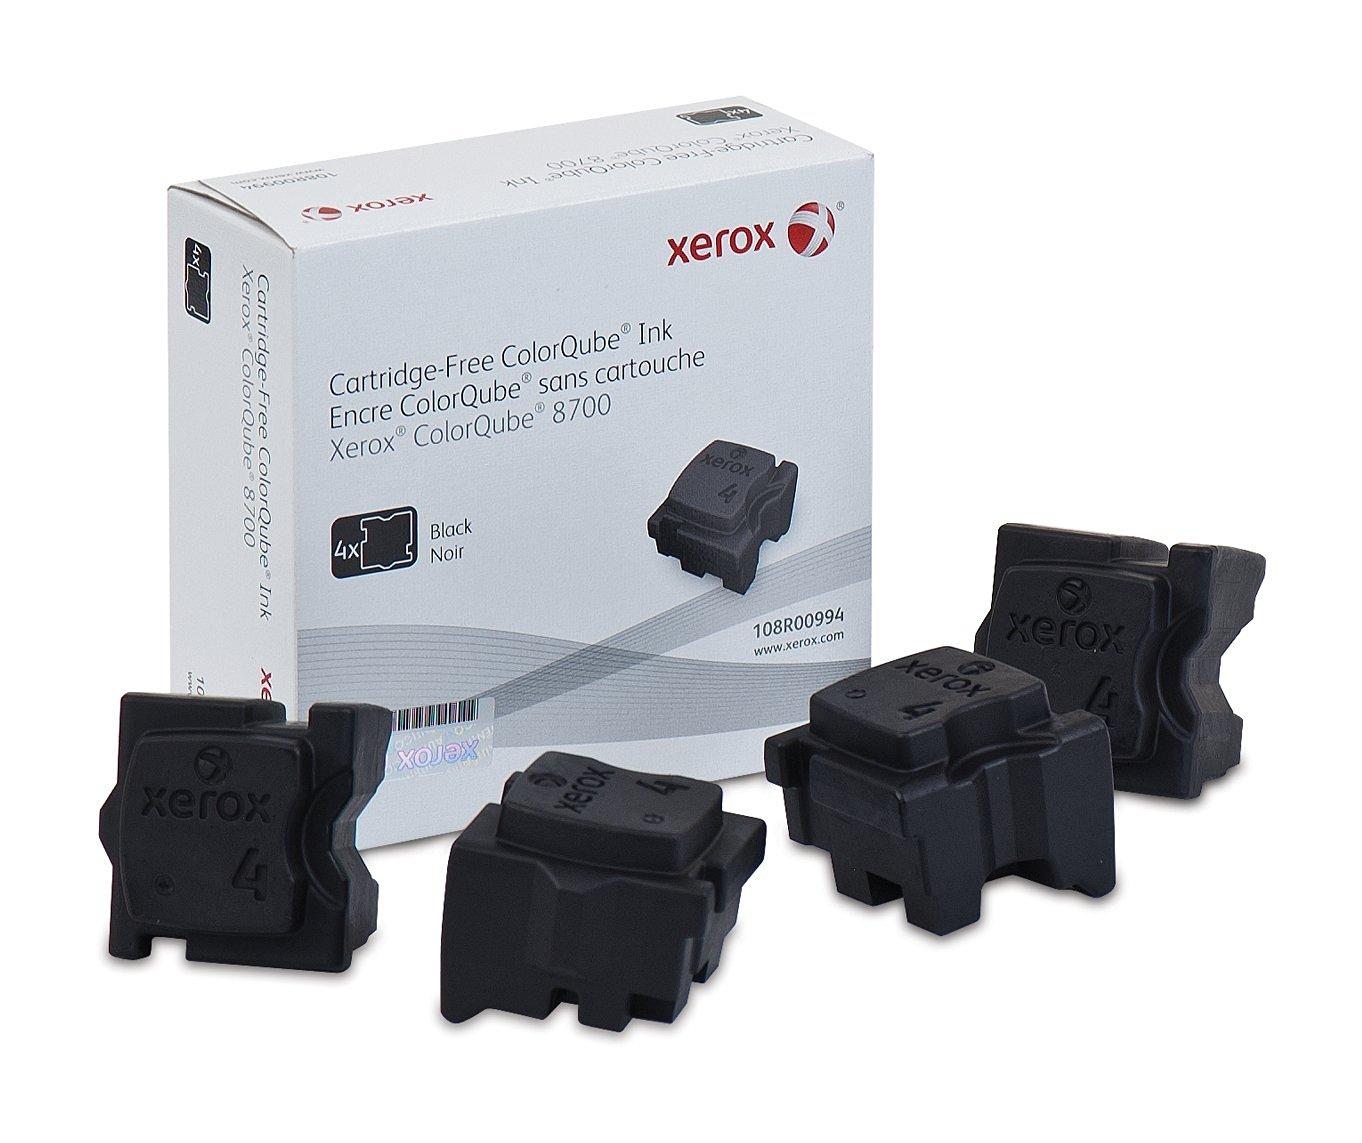 Genuine Xerox Black Solid Ink Sticks for the Xerox ColorQube 8700 (4 pcs/Box), 108R00994